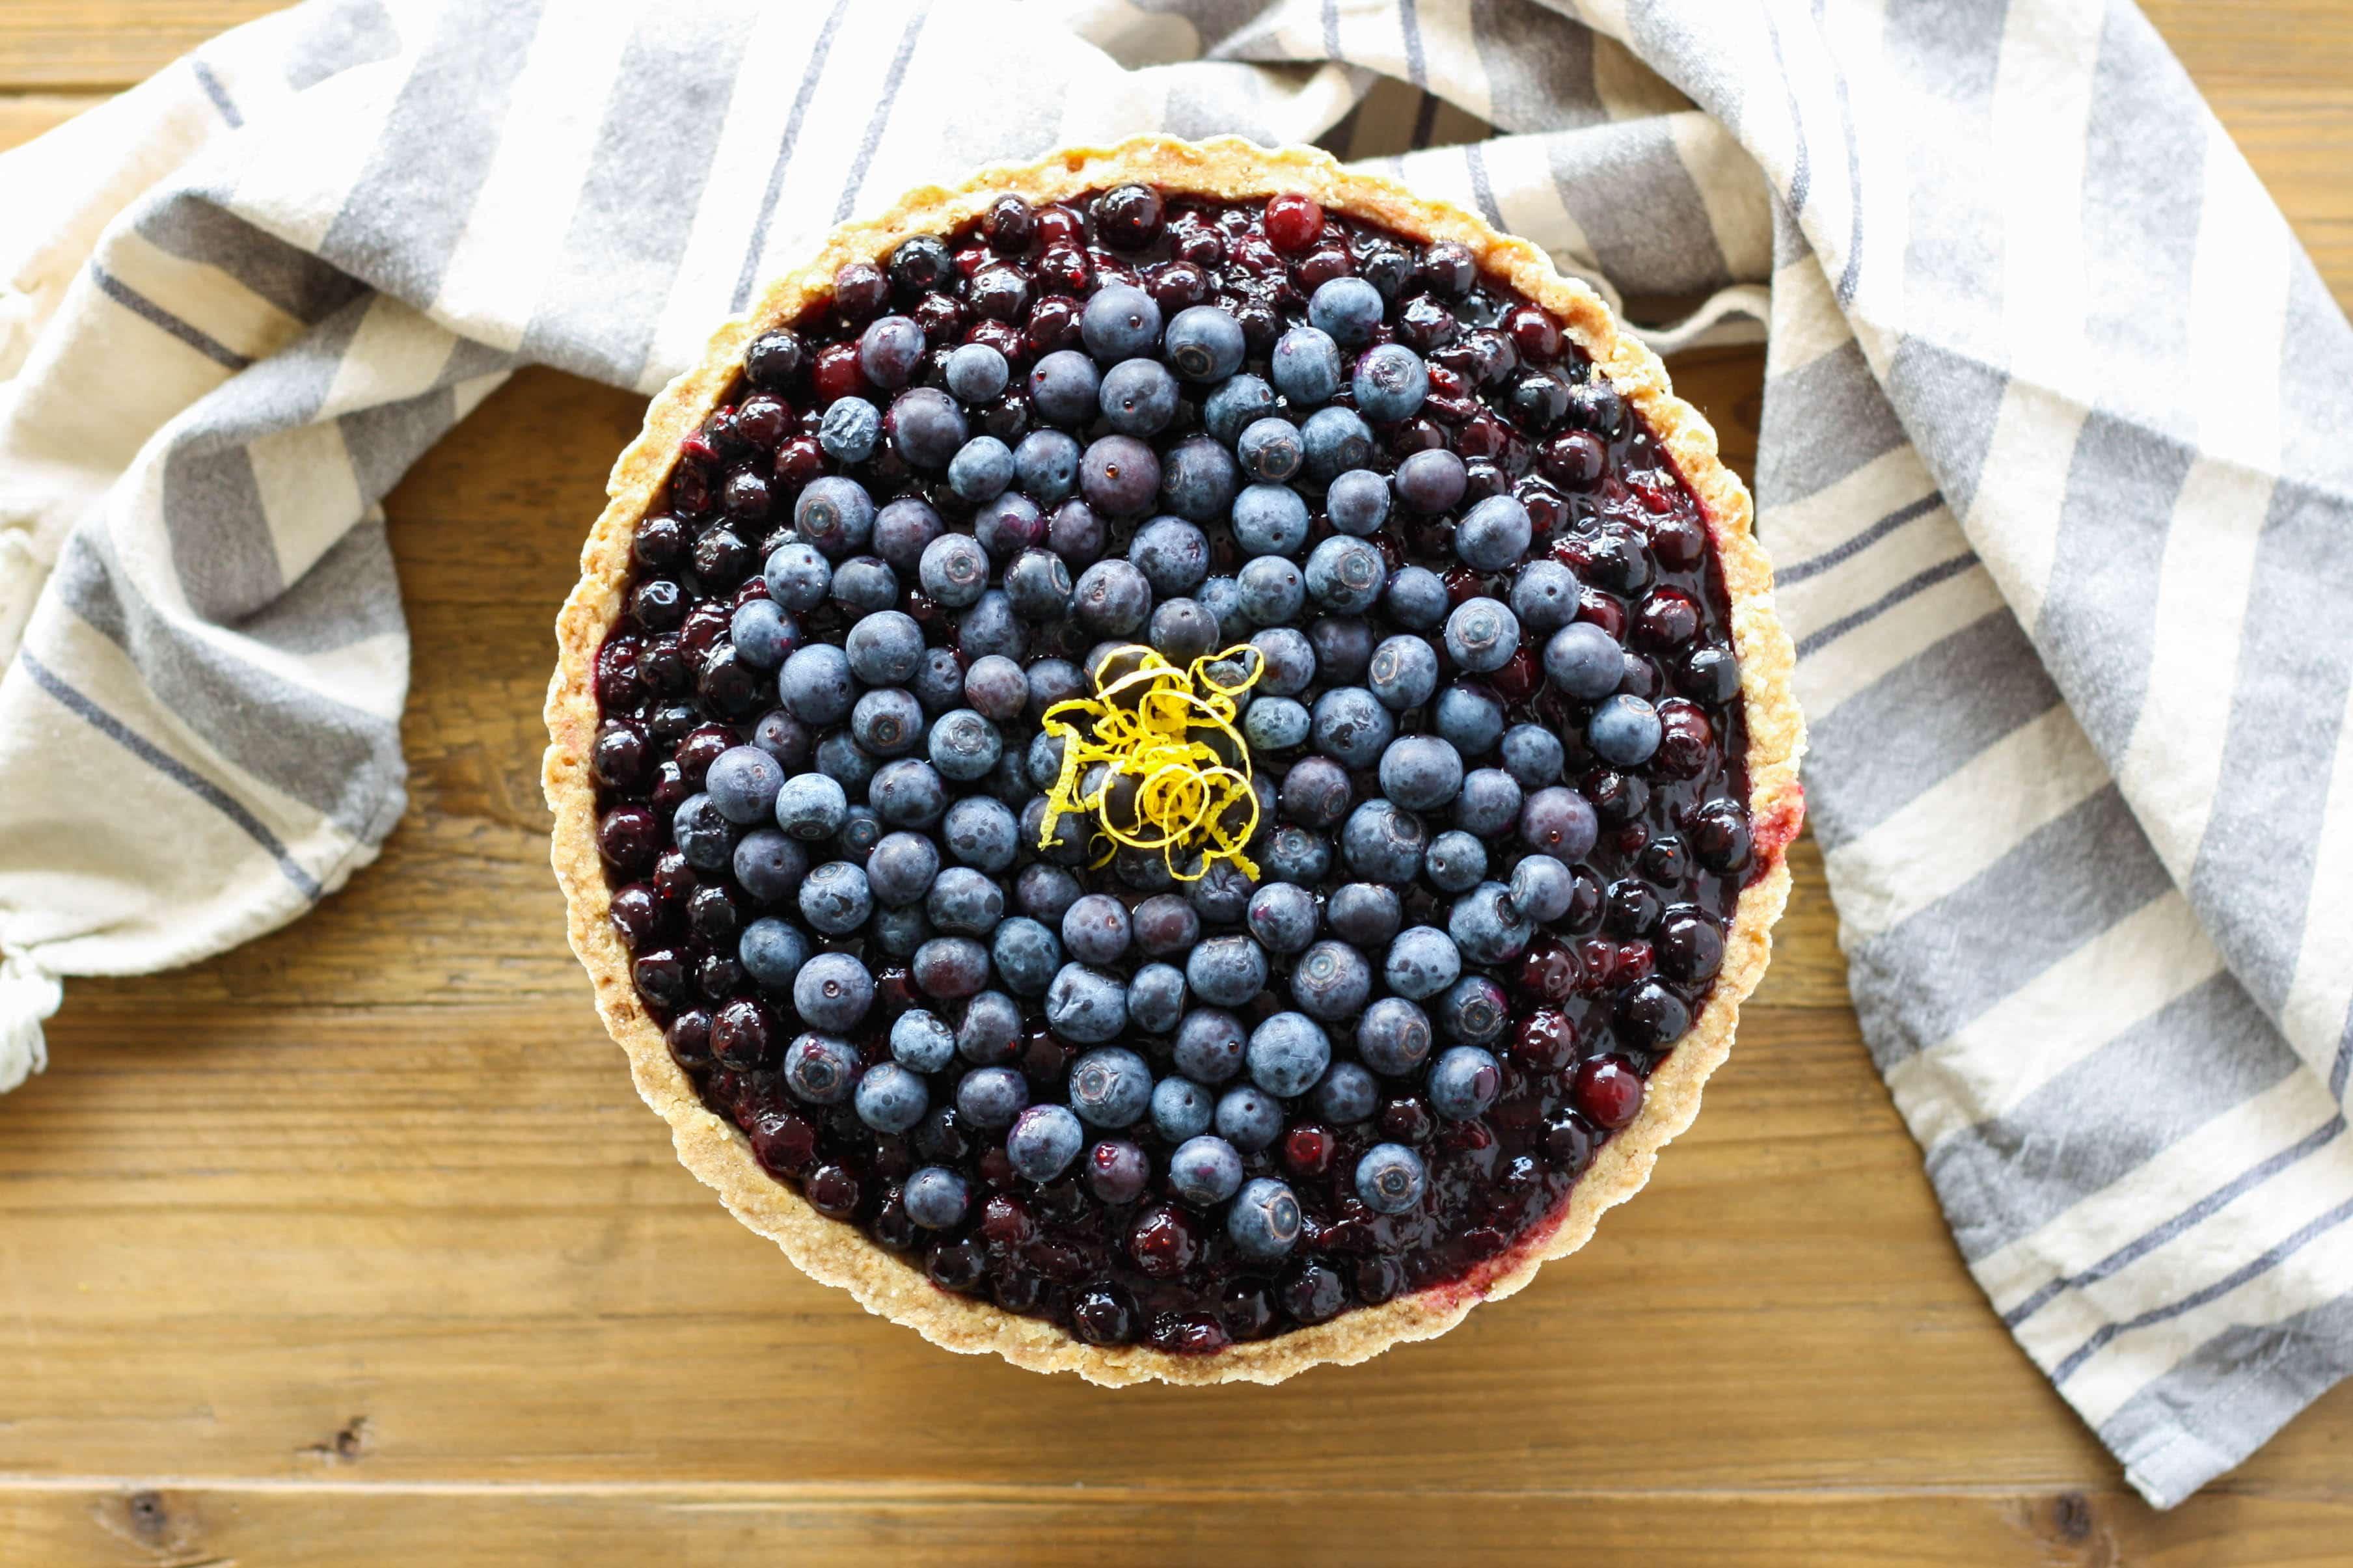 dessert food | Dessert recipes, Desserts, Food